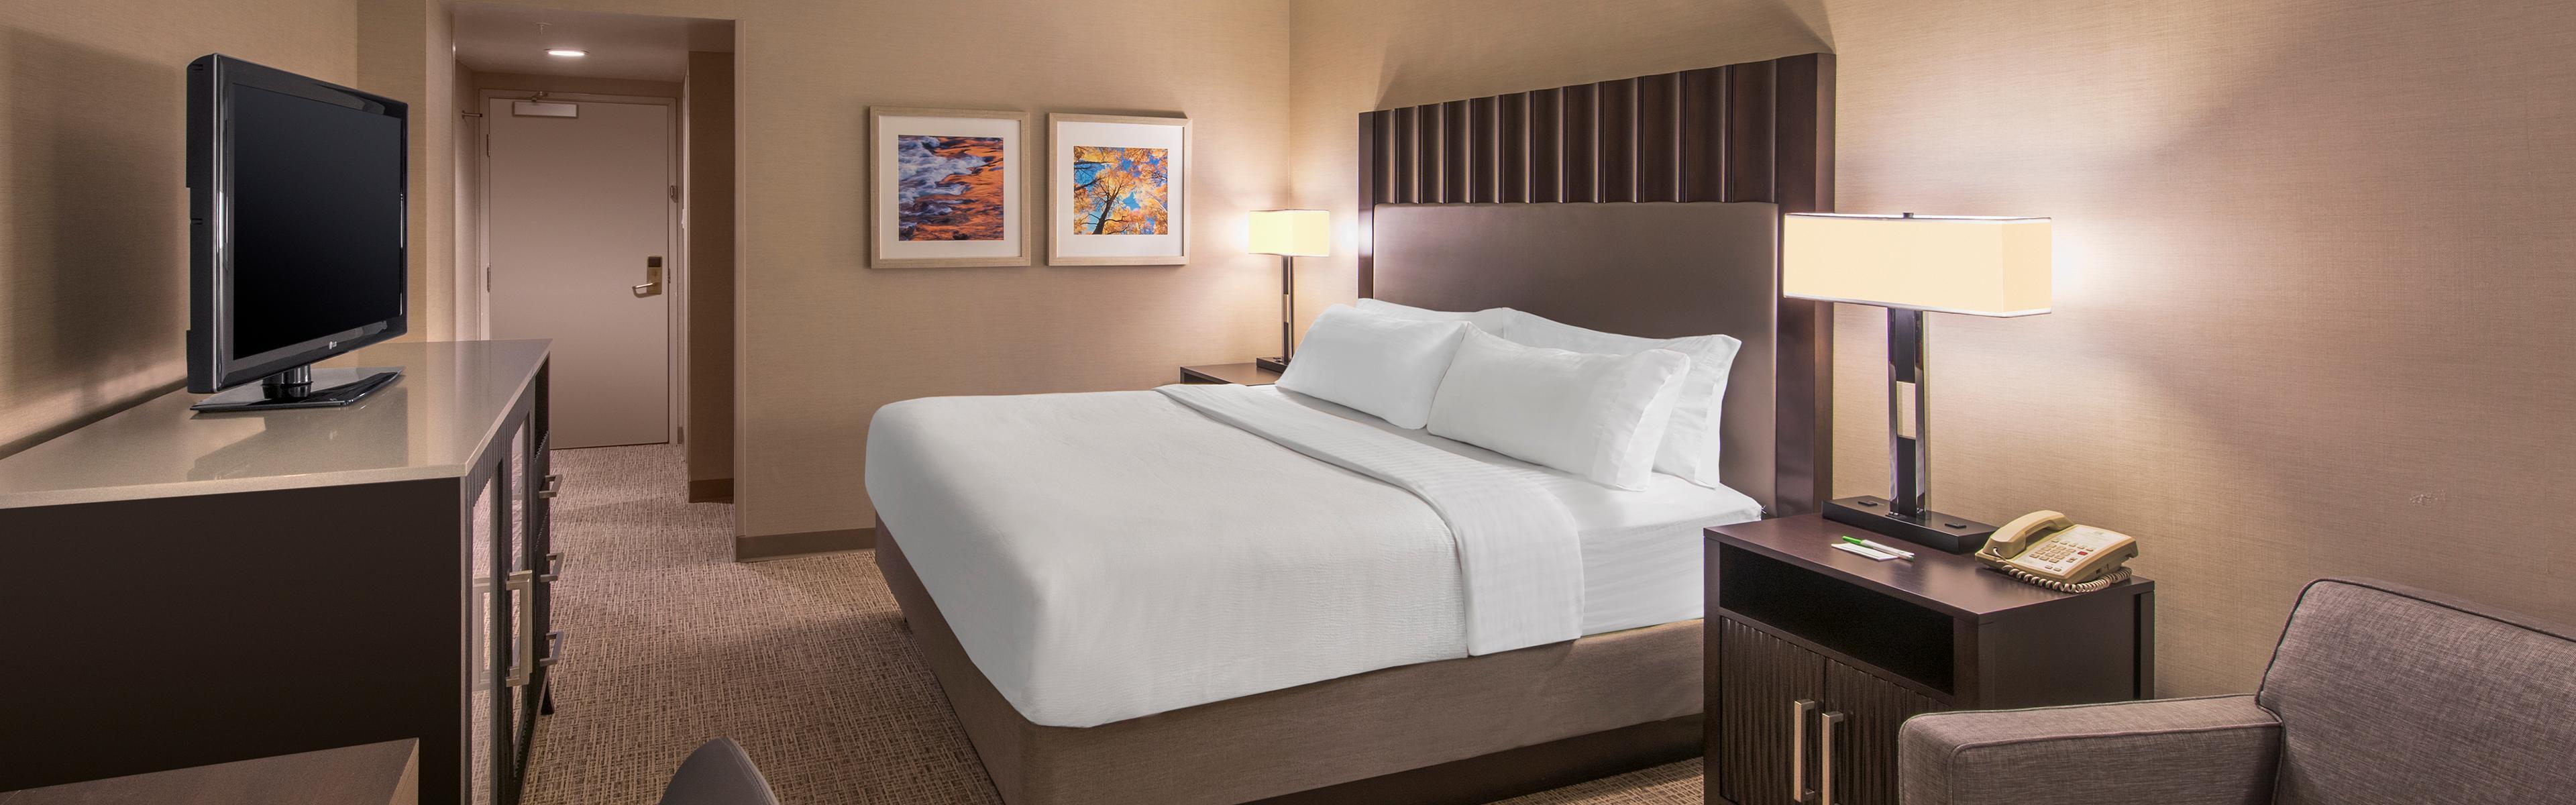 Holiday Inn Denver Lakewood Lakewood Colorado Co